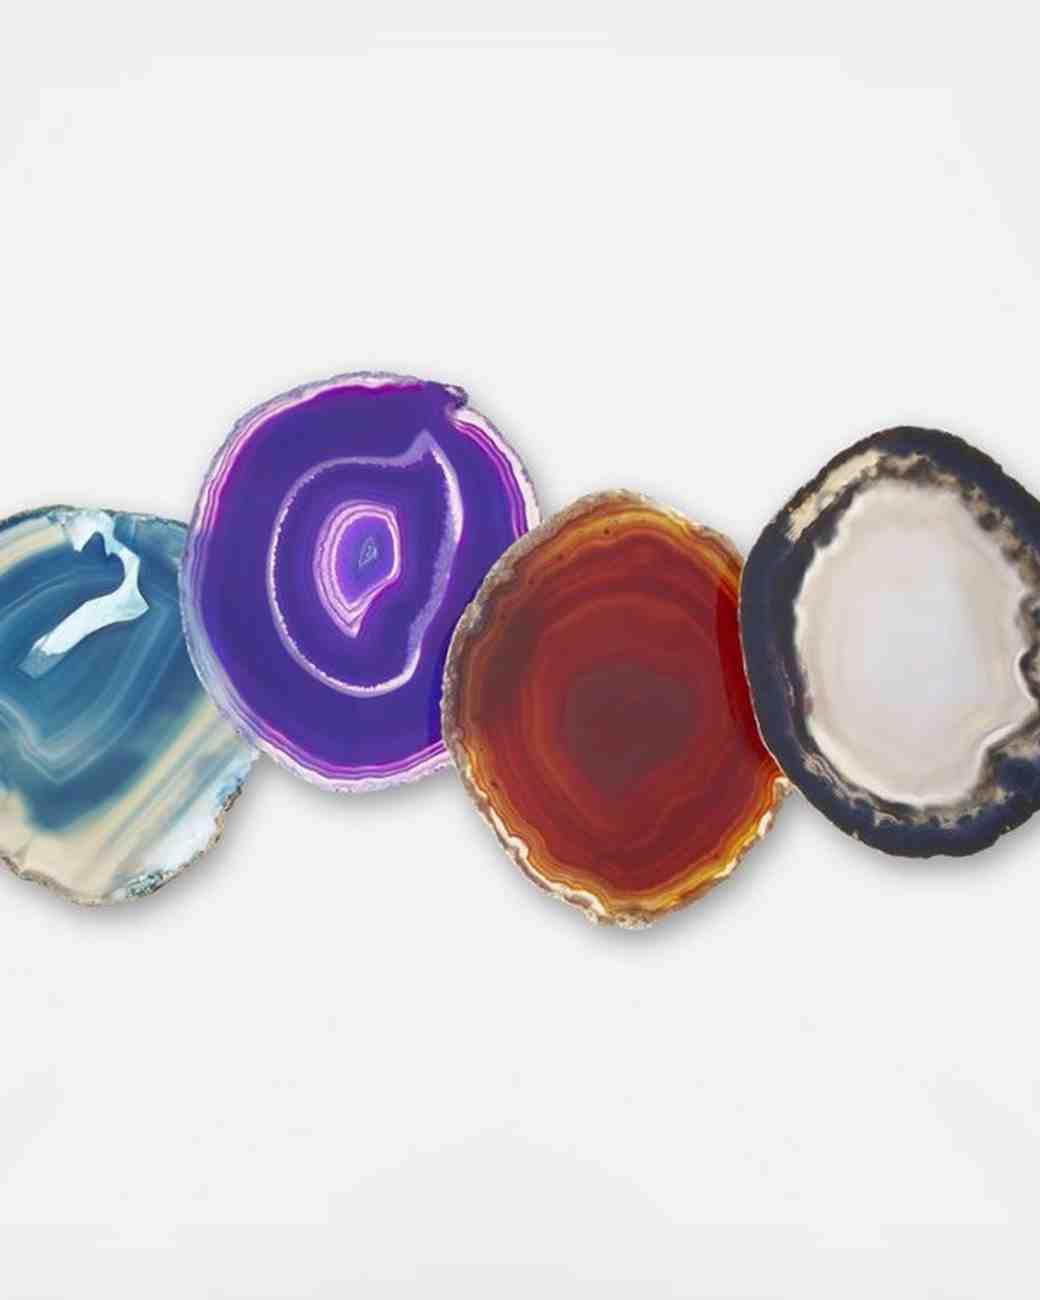 Geode Coasters